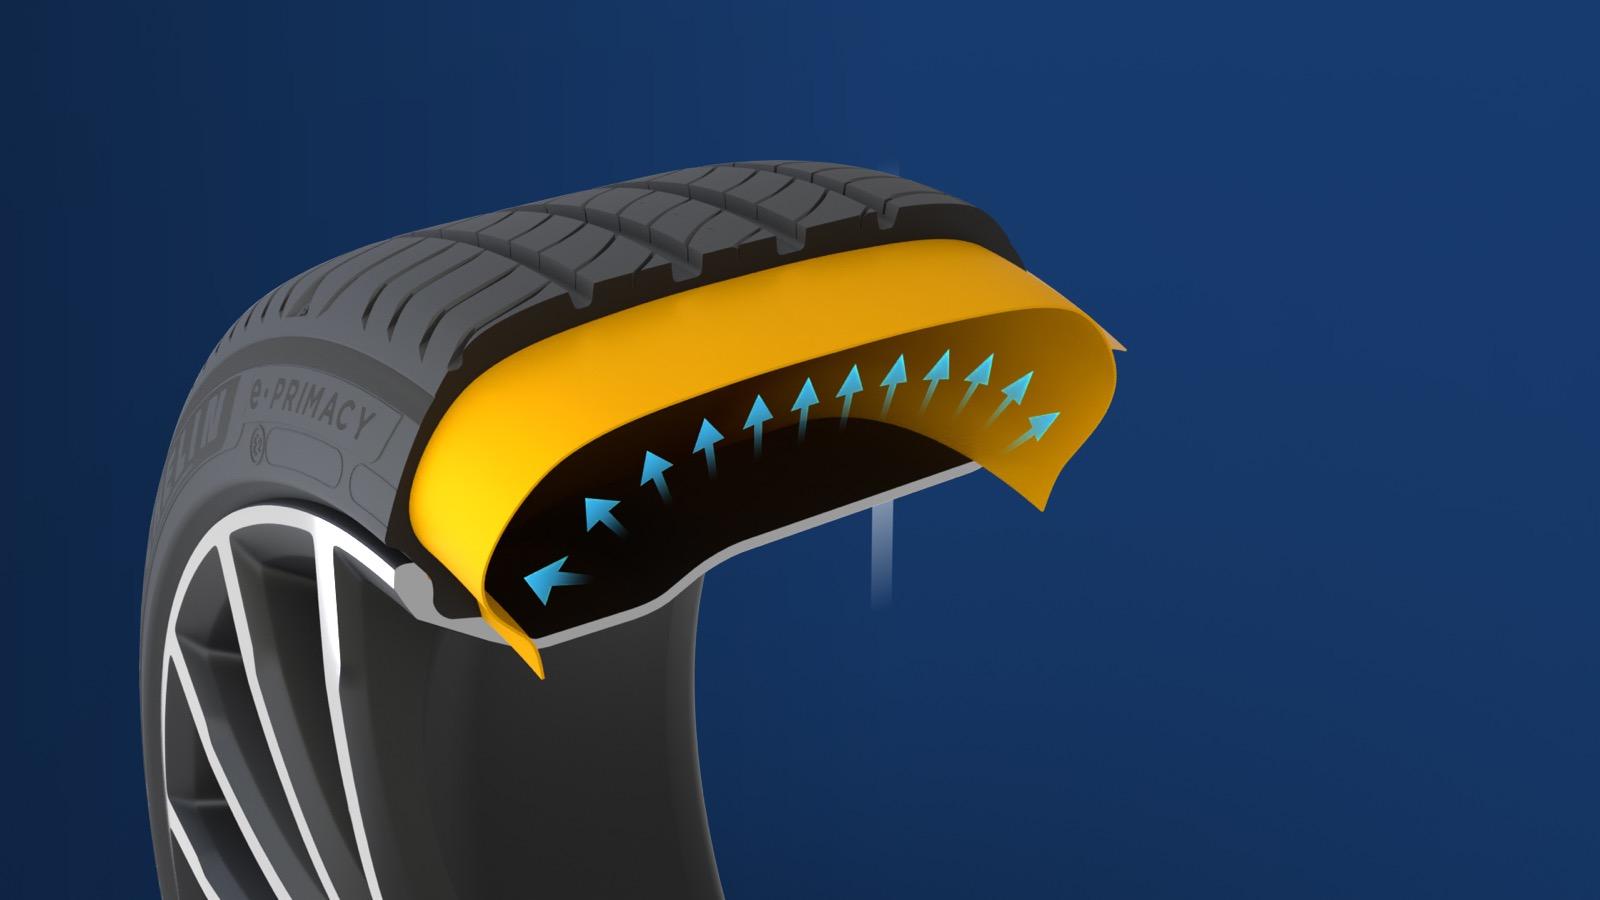 Michelin Eprimacy Airshield